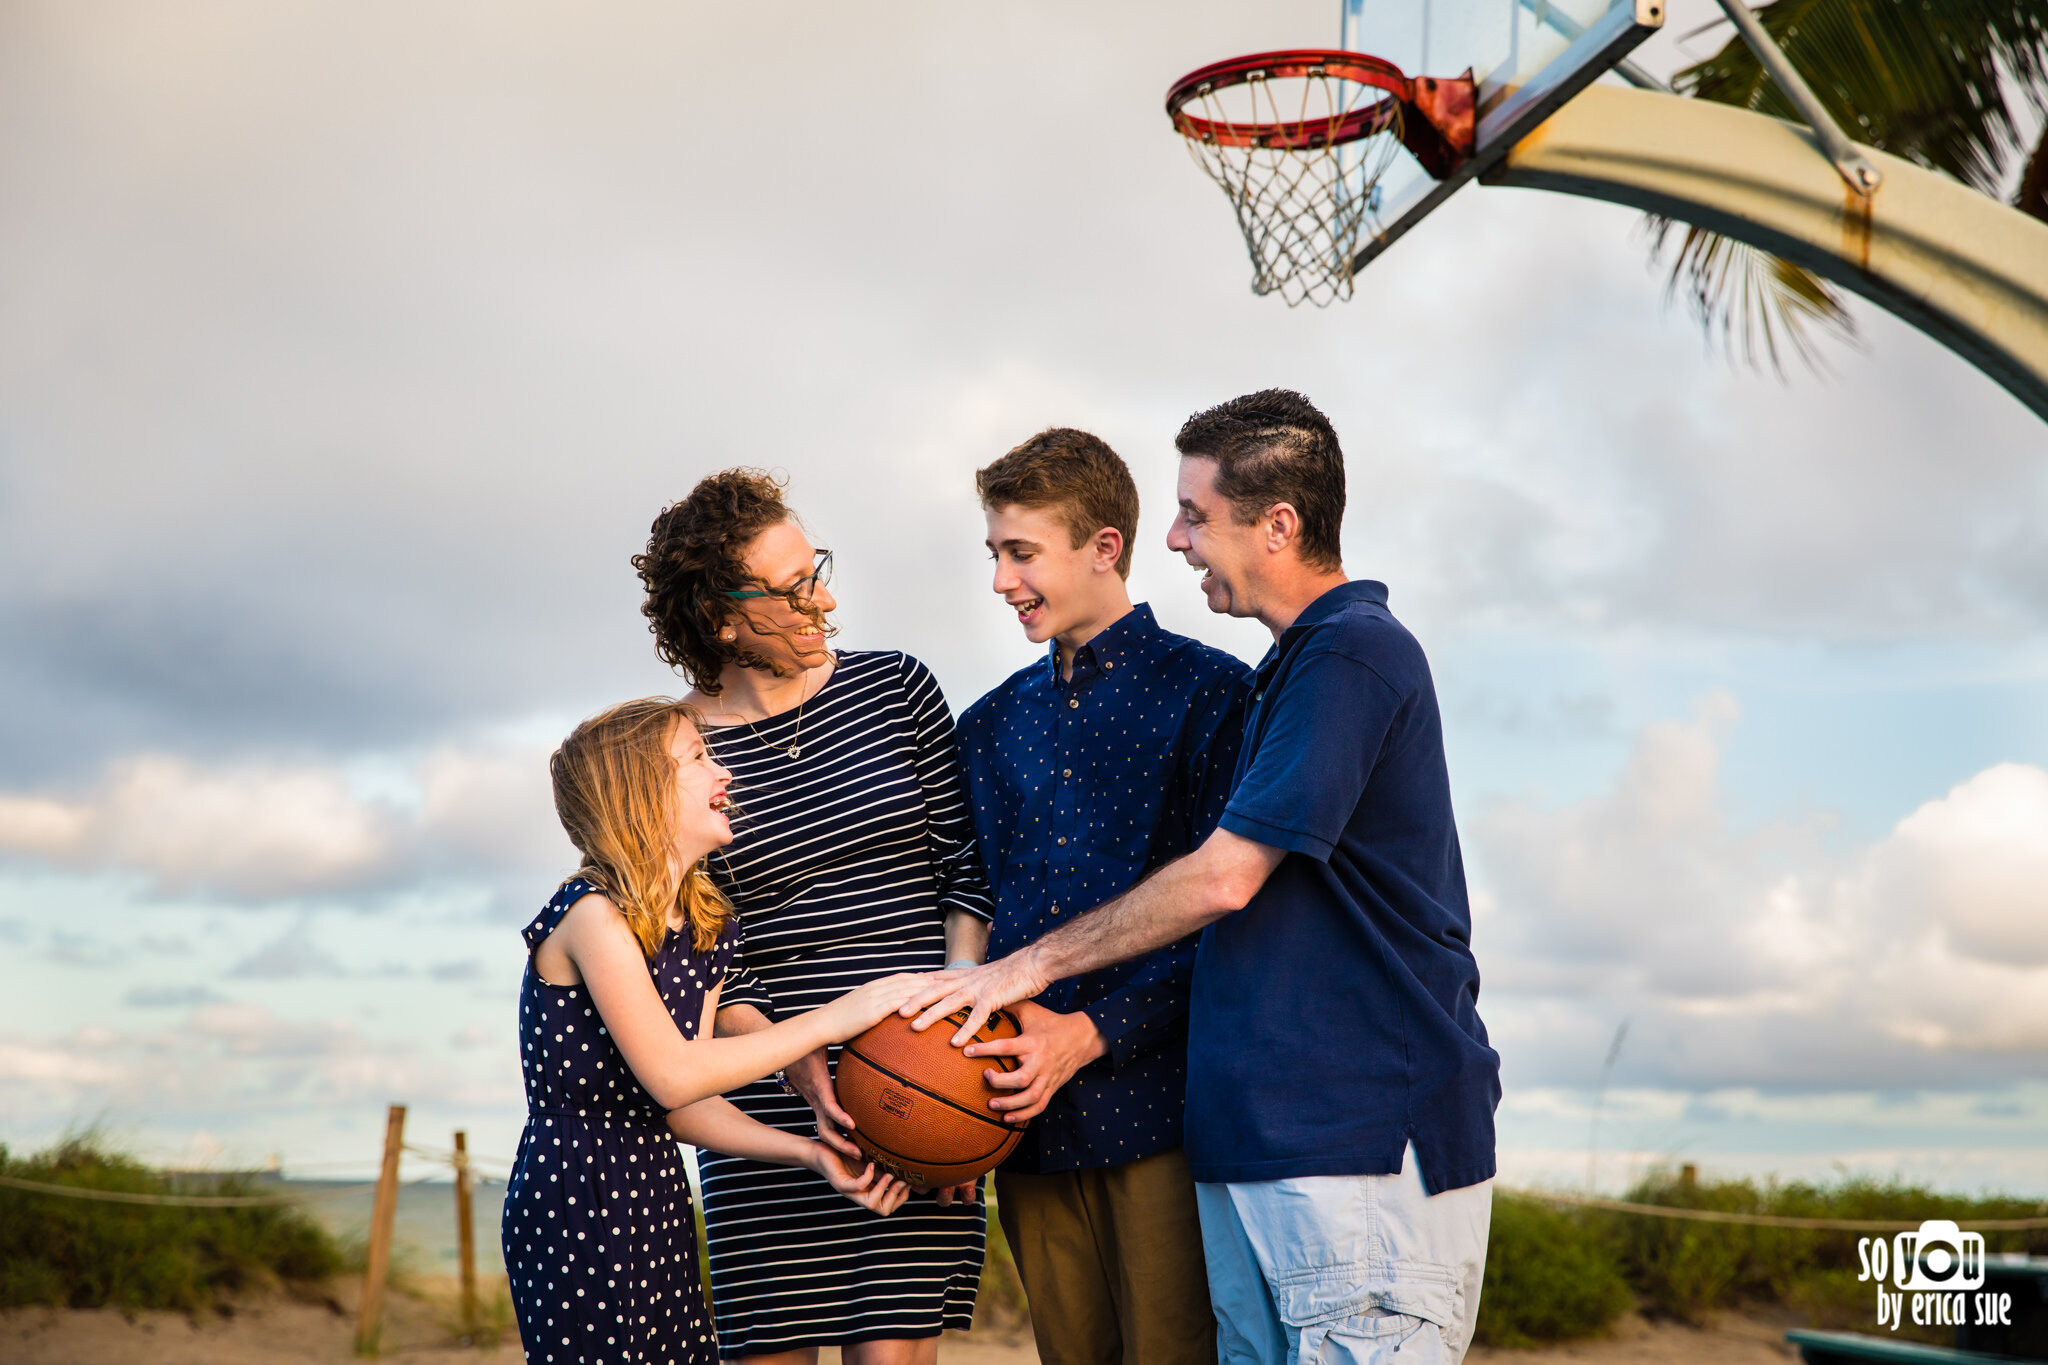 so-you-by-erica-sue-ft-lauderdale-beach-basketball-mitzvah-pre-shoot-9609.JPG